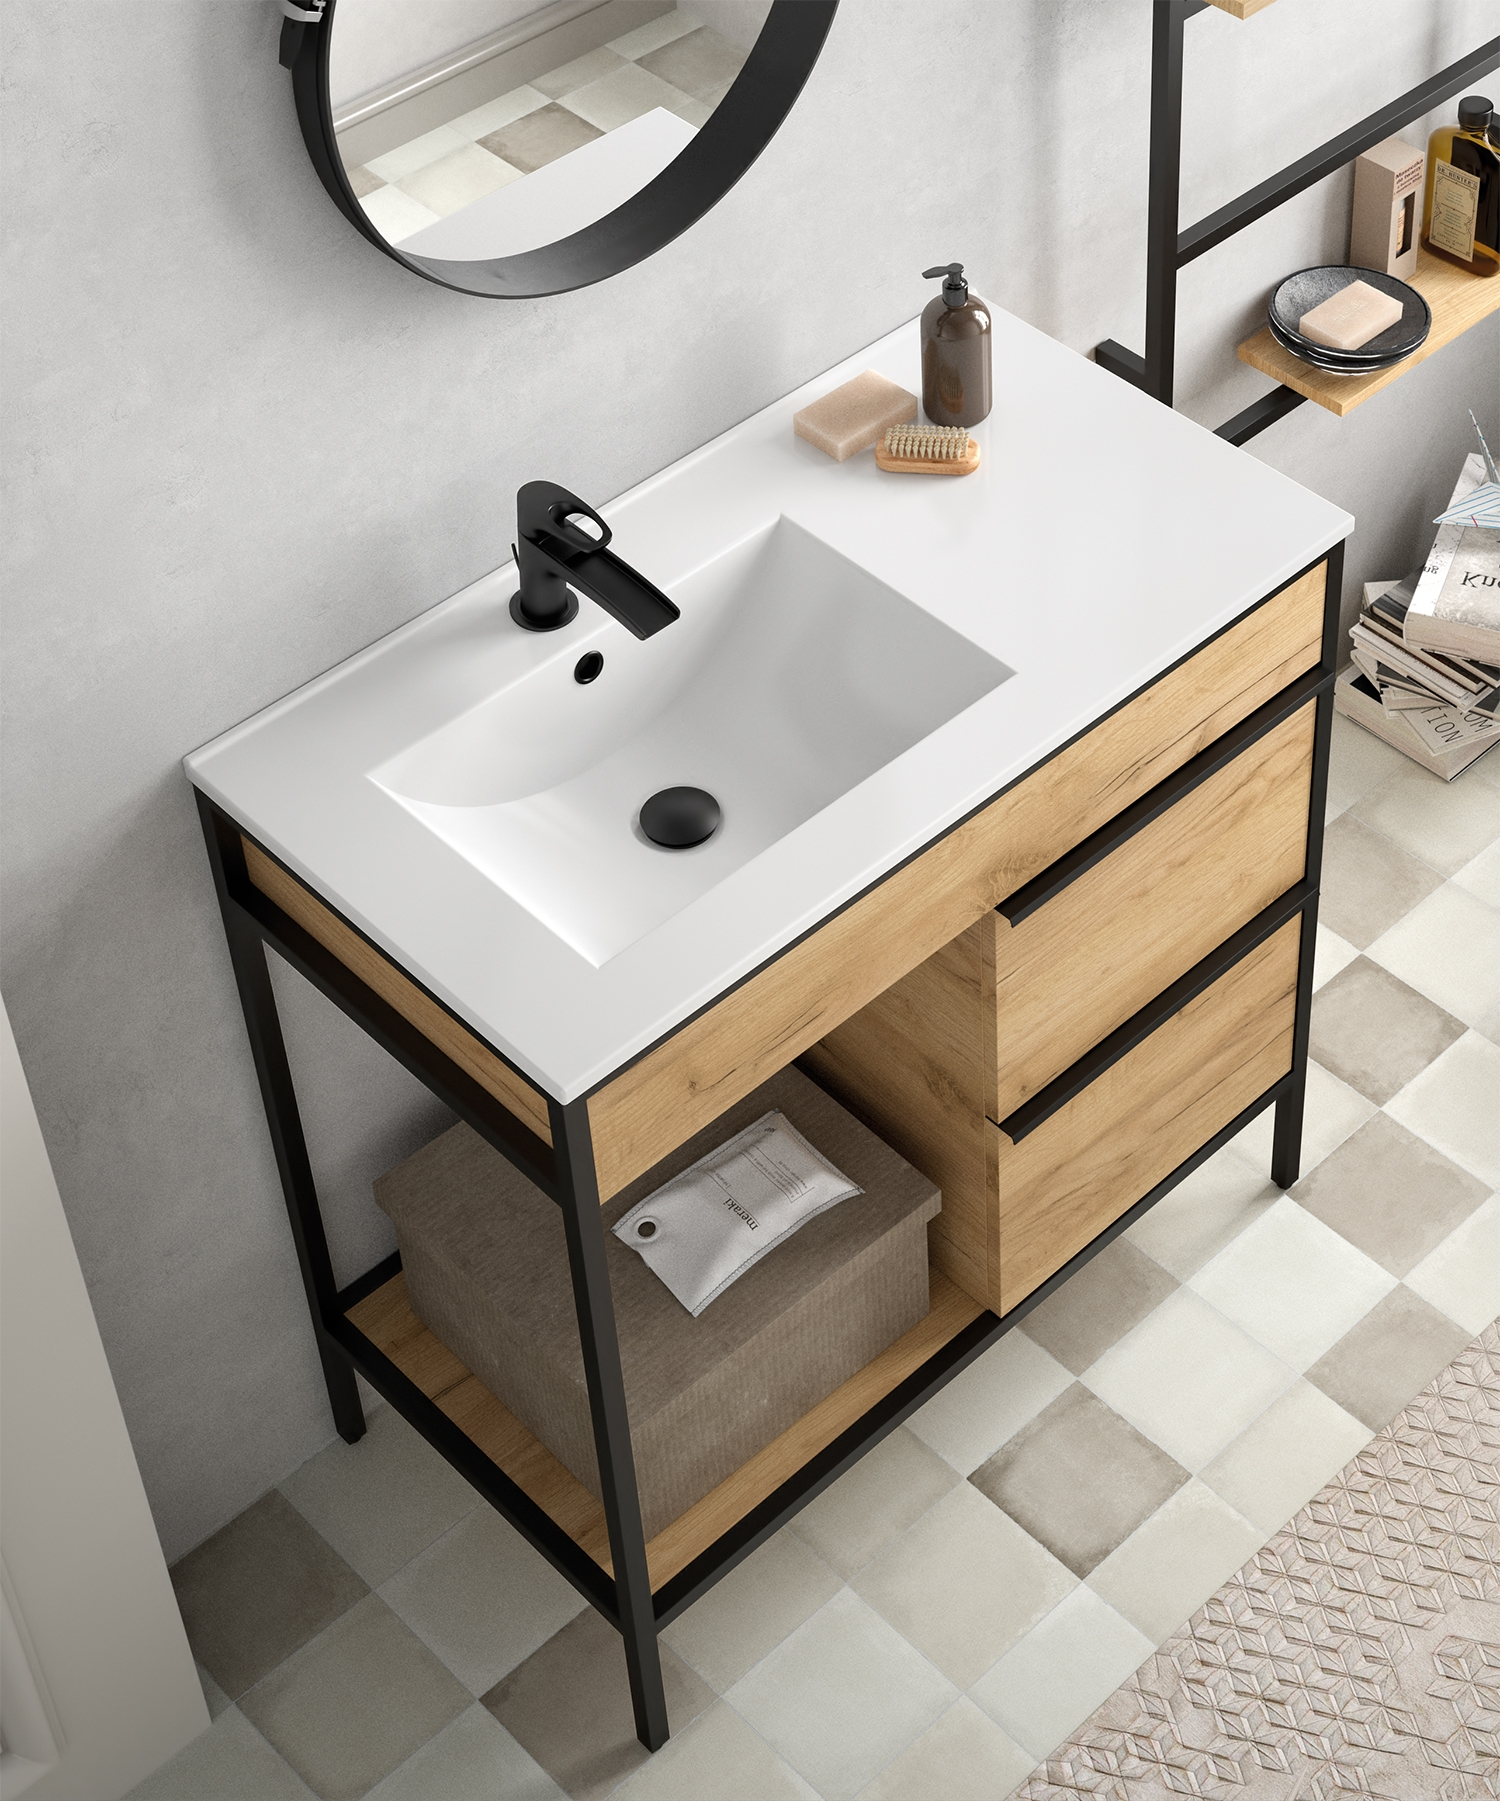 Muebles Davinci 120cm badkamermeubel met geïntegreerde wastafel links